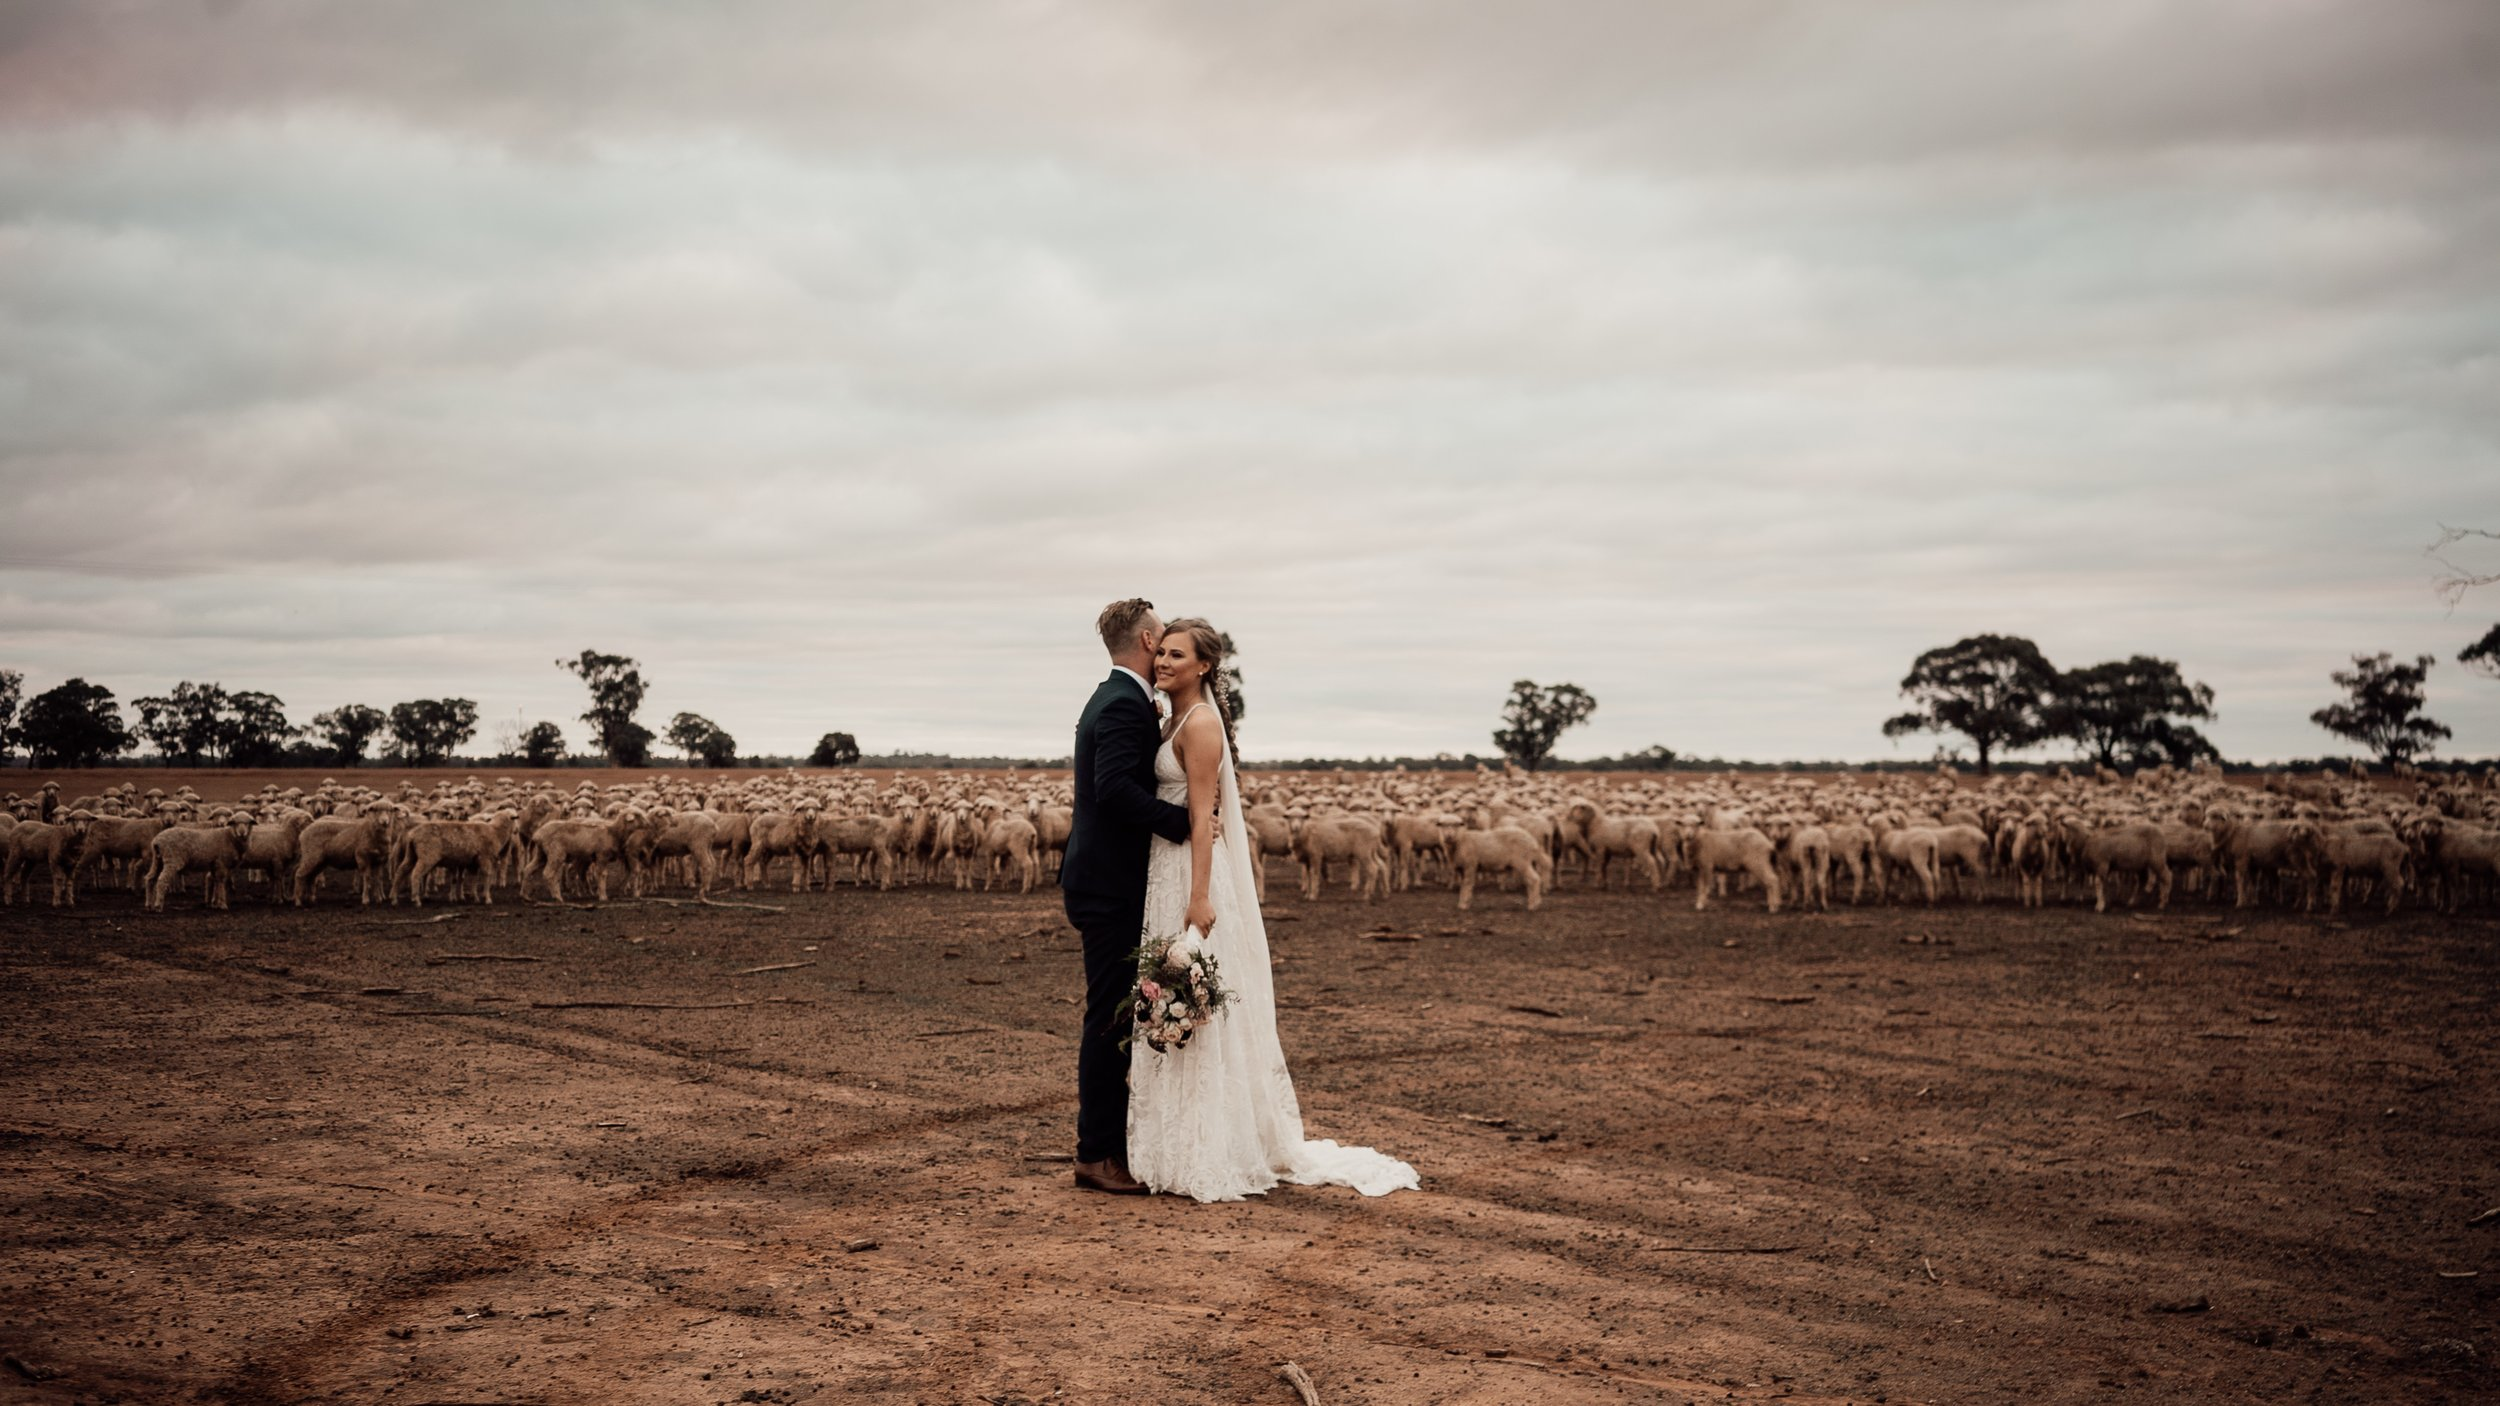 mickalathomas_puremacphotography_weddingphotographer_couplephotographer_Sheppartonphotographer_1466.jpg